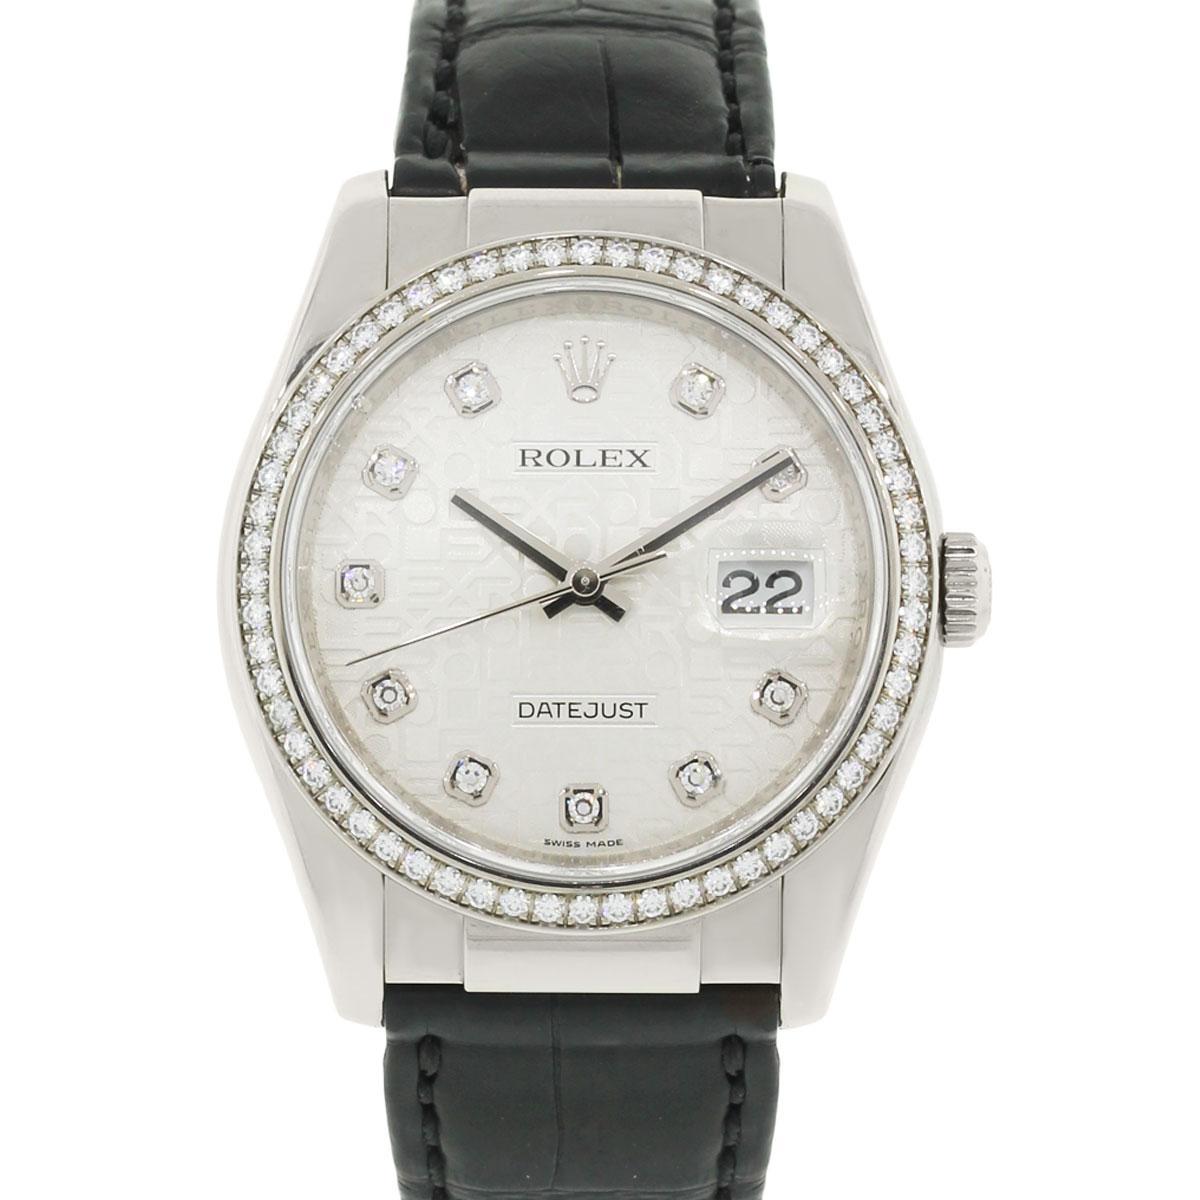 Rolex White Gold Diamond Datejust Automatic Wristwatch Ref 116189